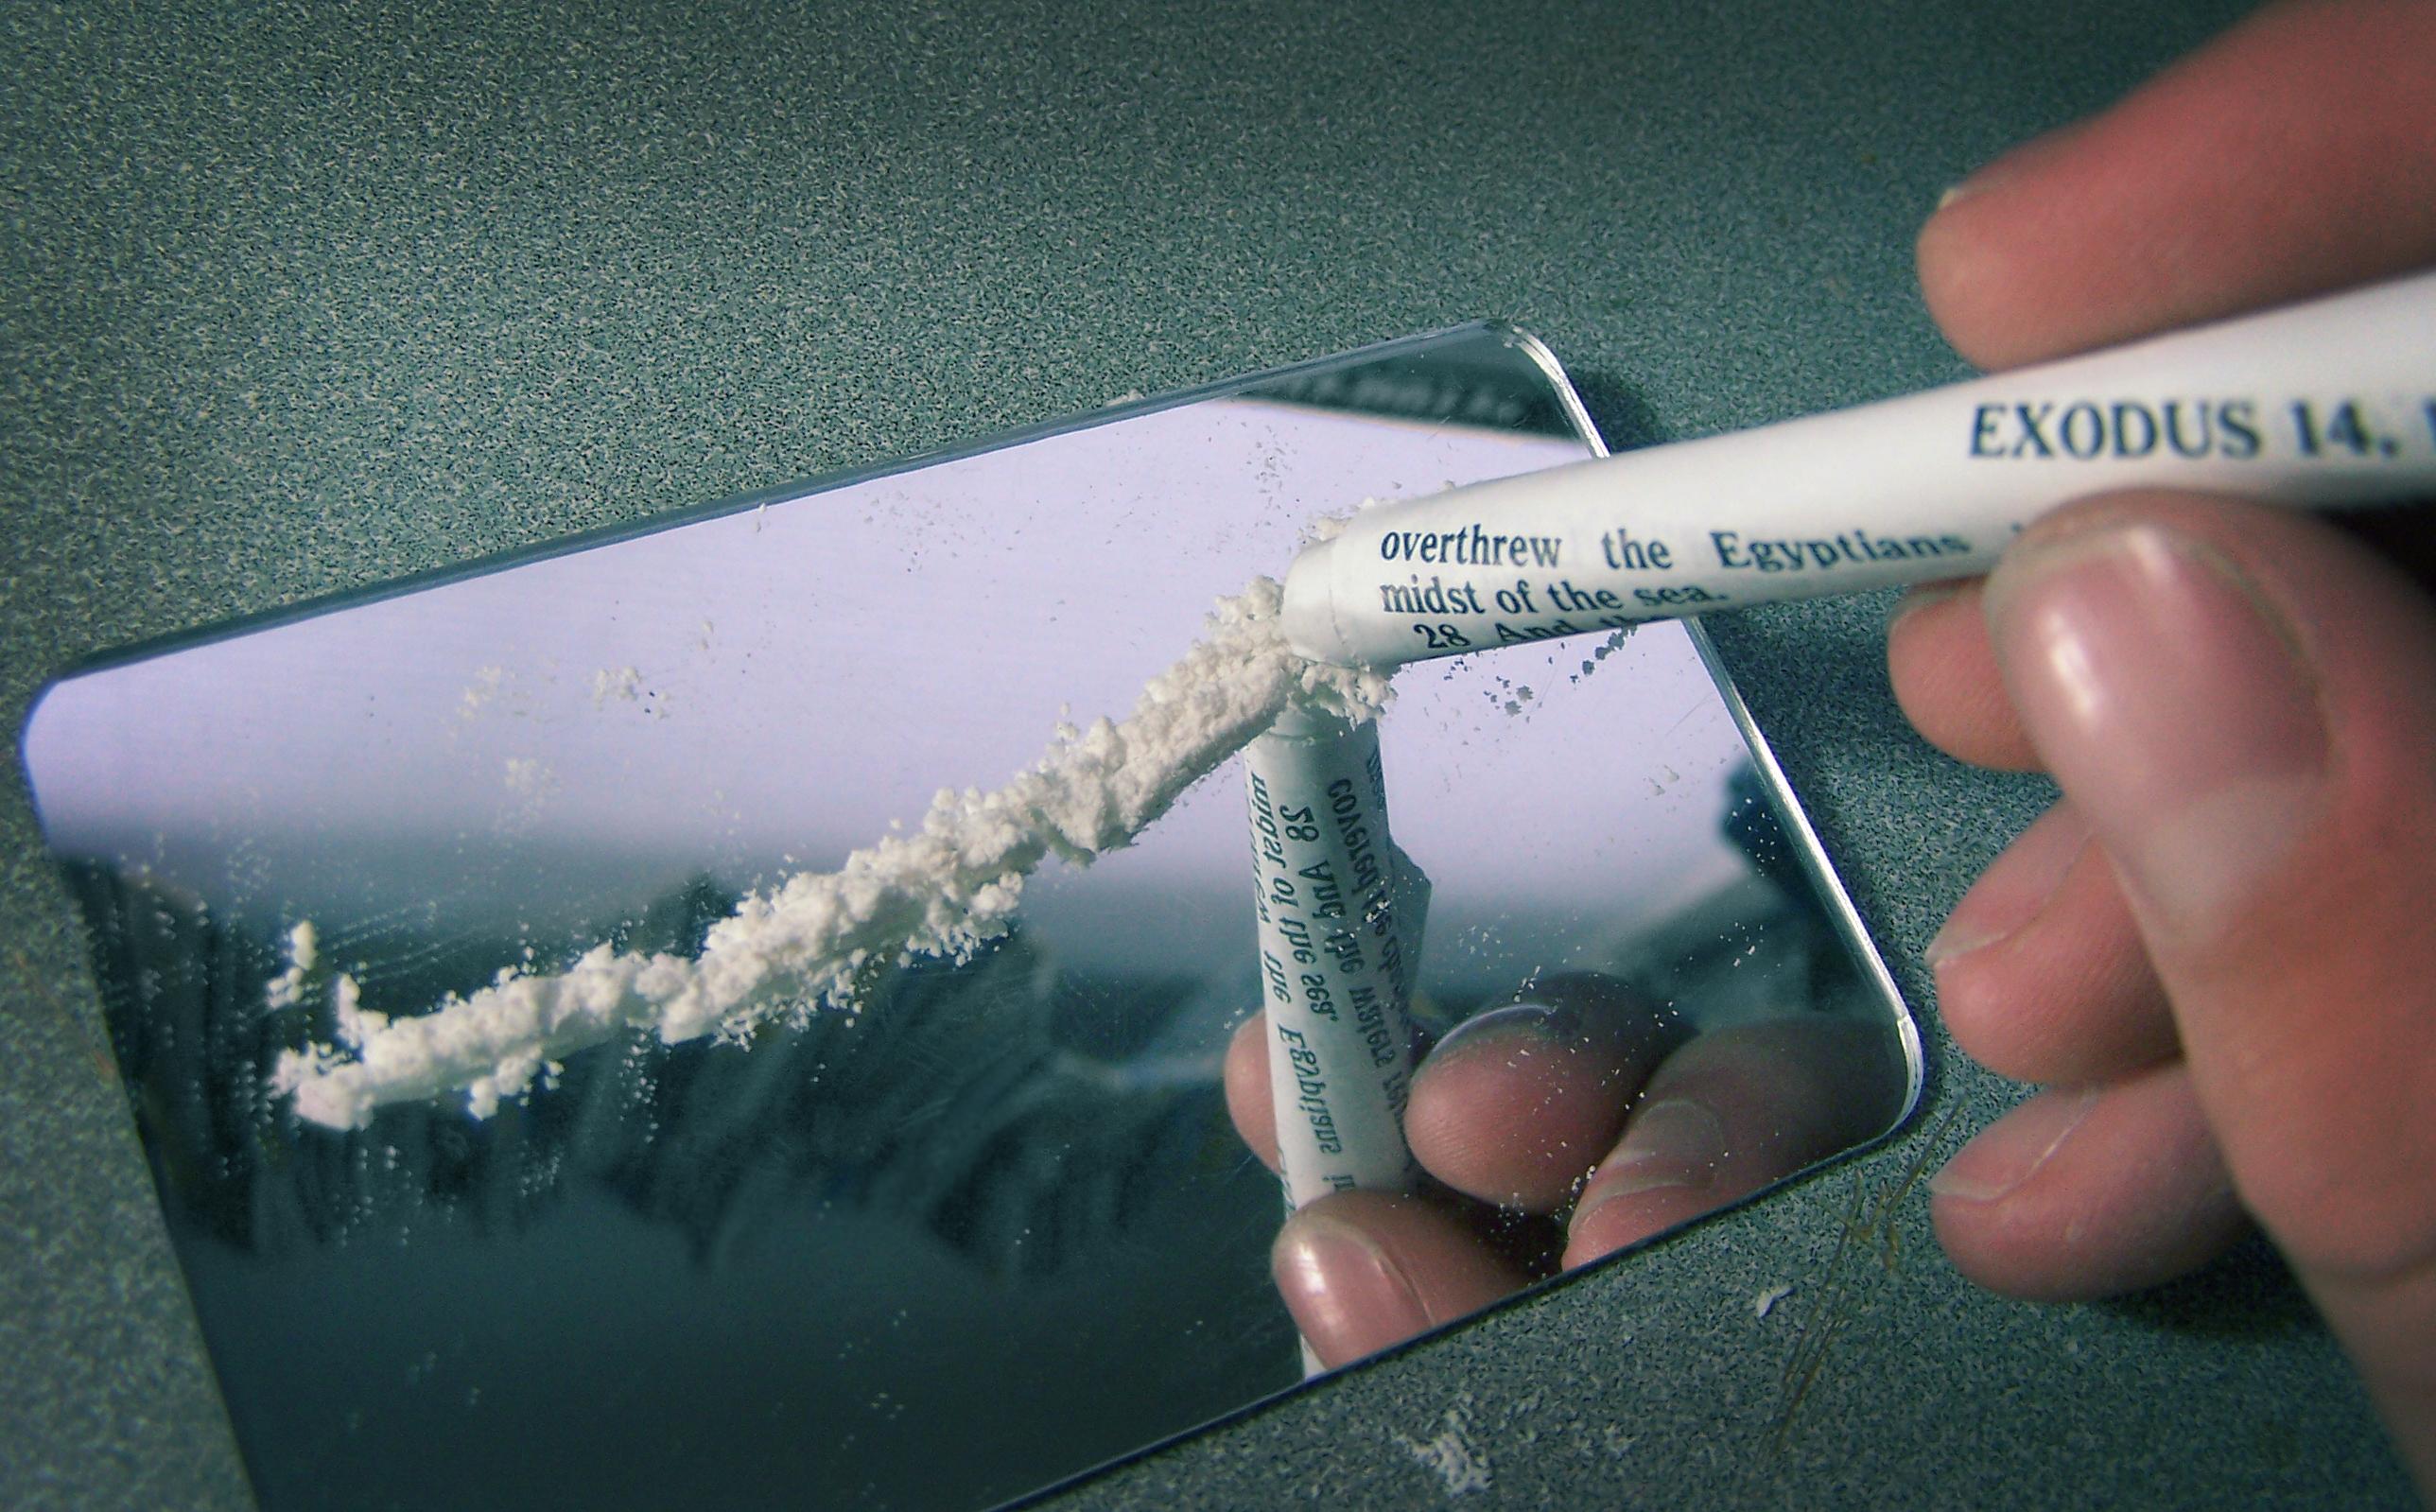 12-tonne cocaine shipment